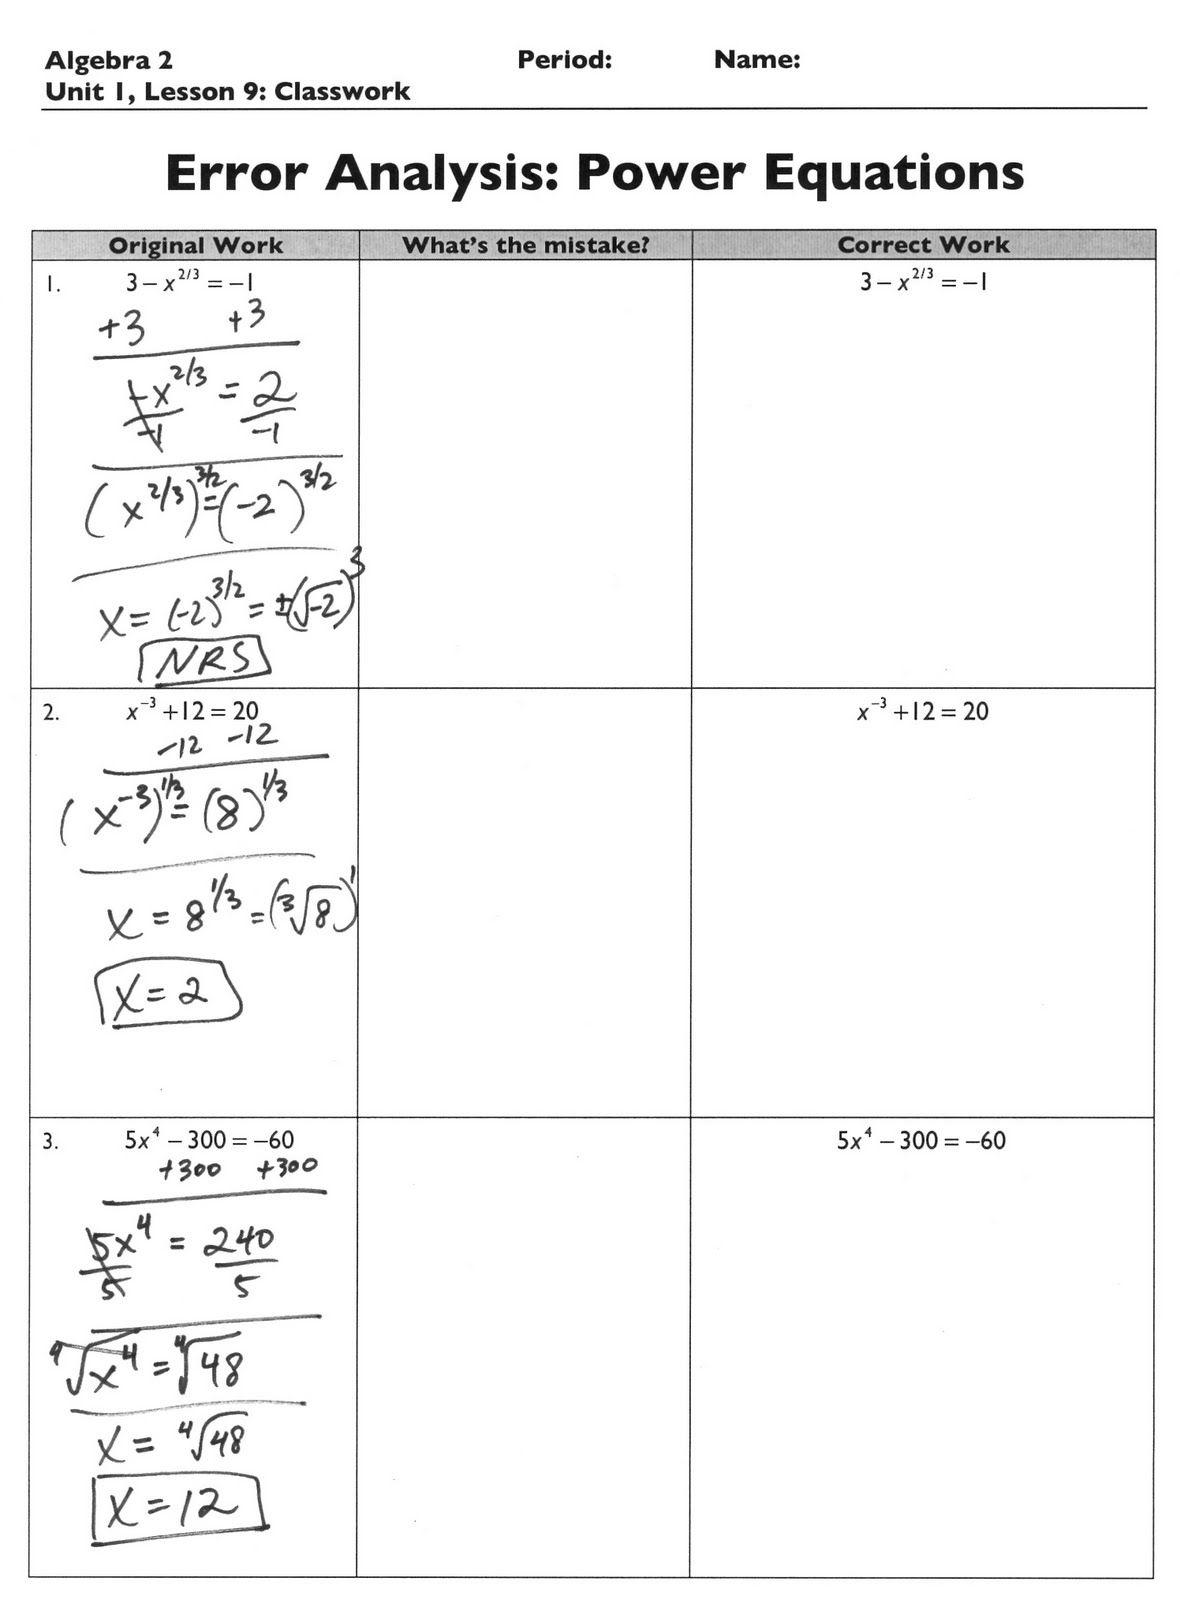 The Exponential Curve Algebra 2 Error Analysis Error Analysis Algebra 2 Teaching Algebra